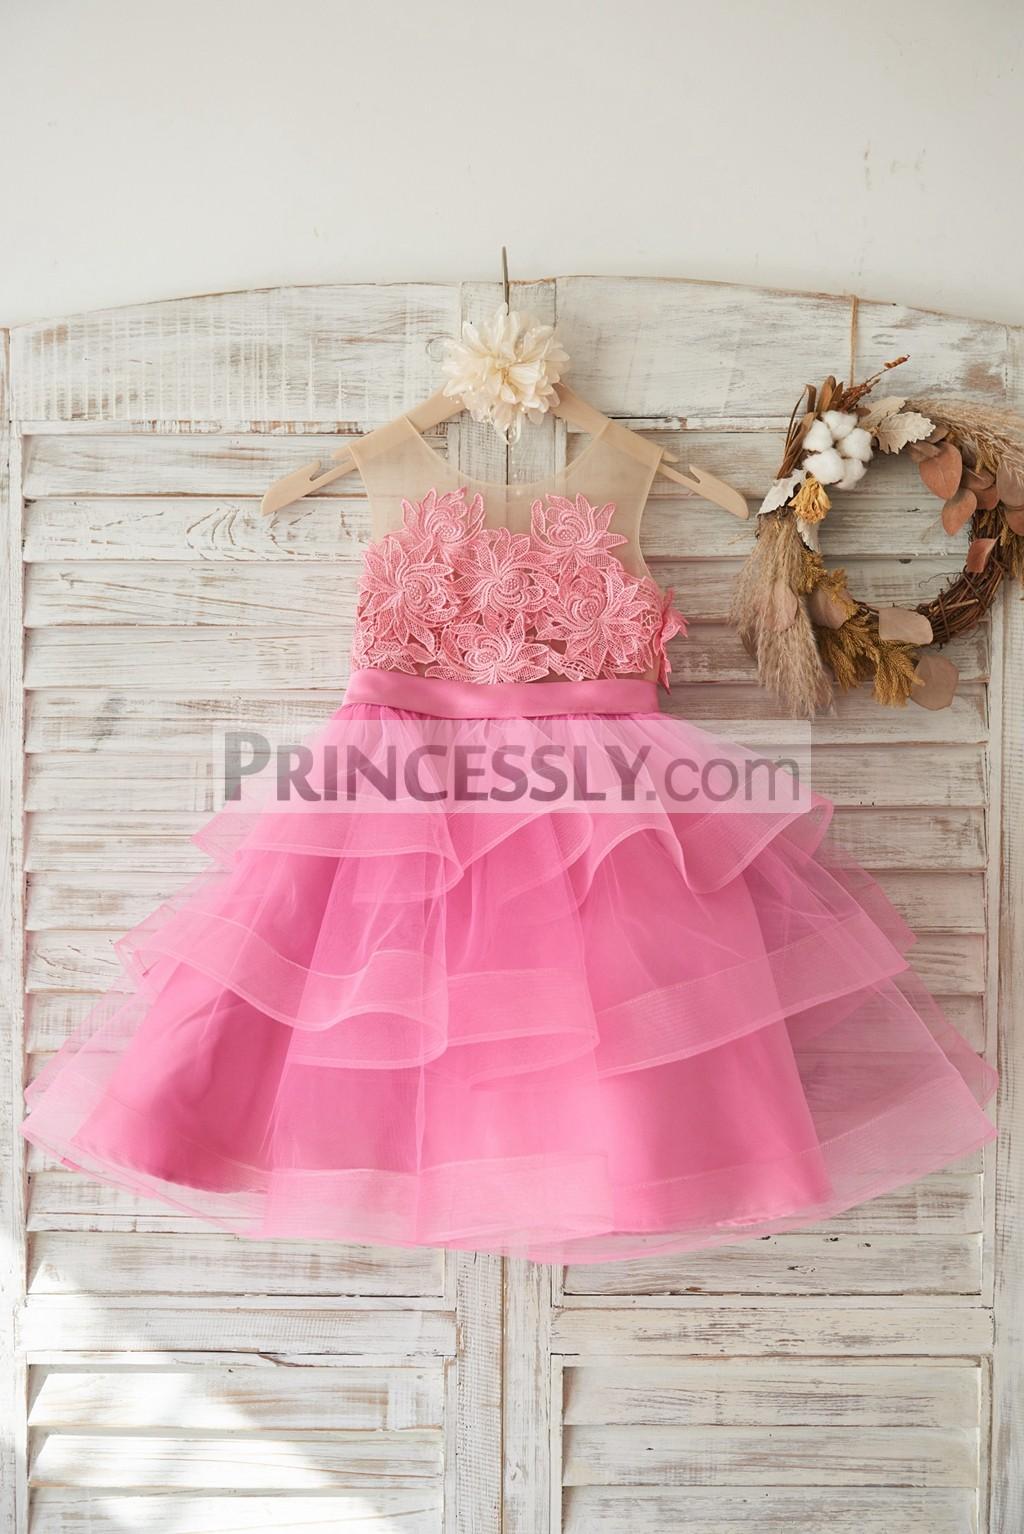 Fuchsia cotton lace applique cupcake tulle flower girl dress